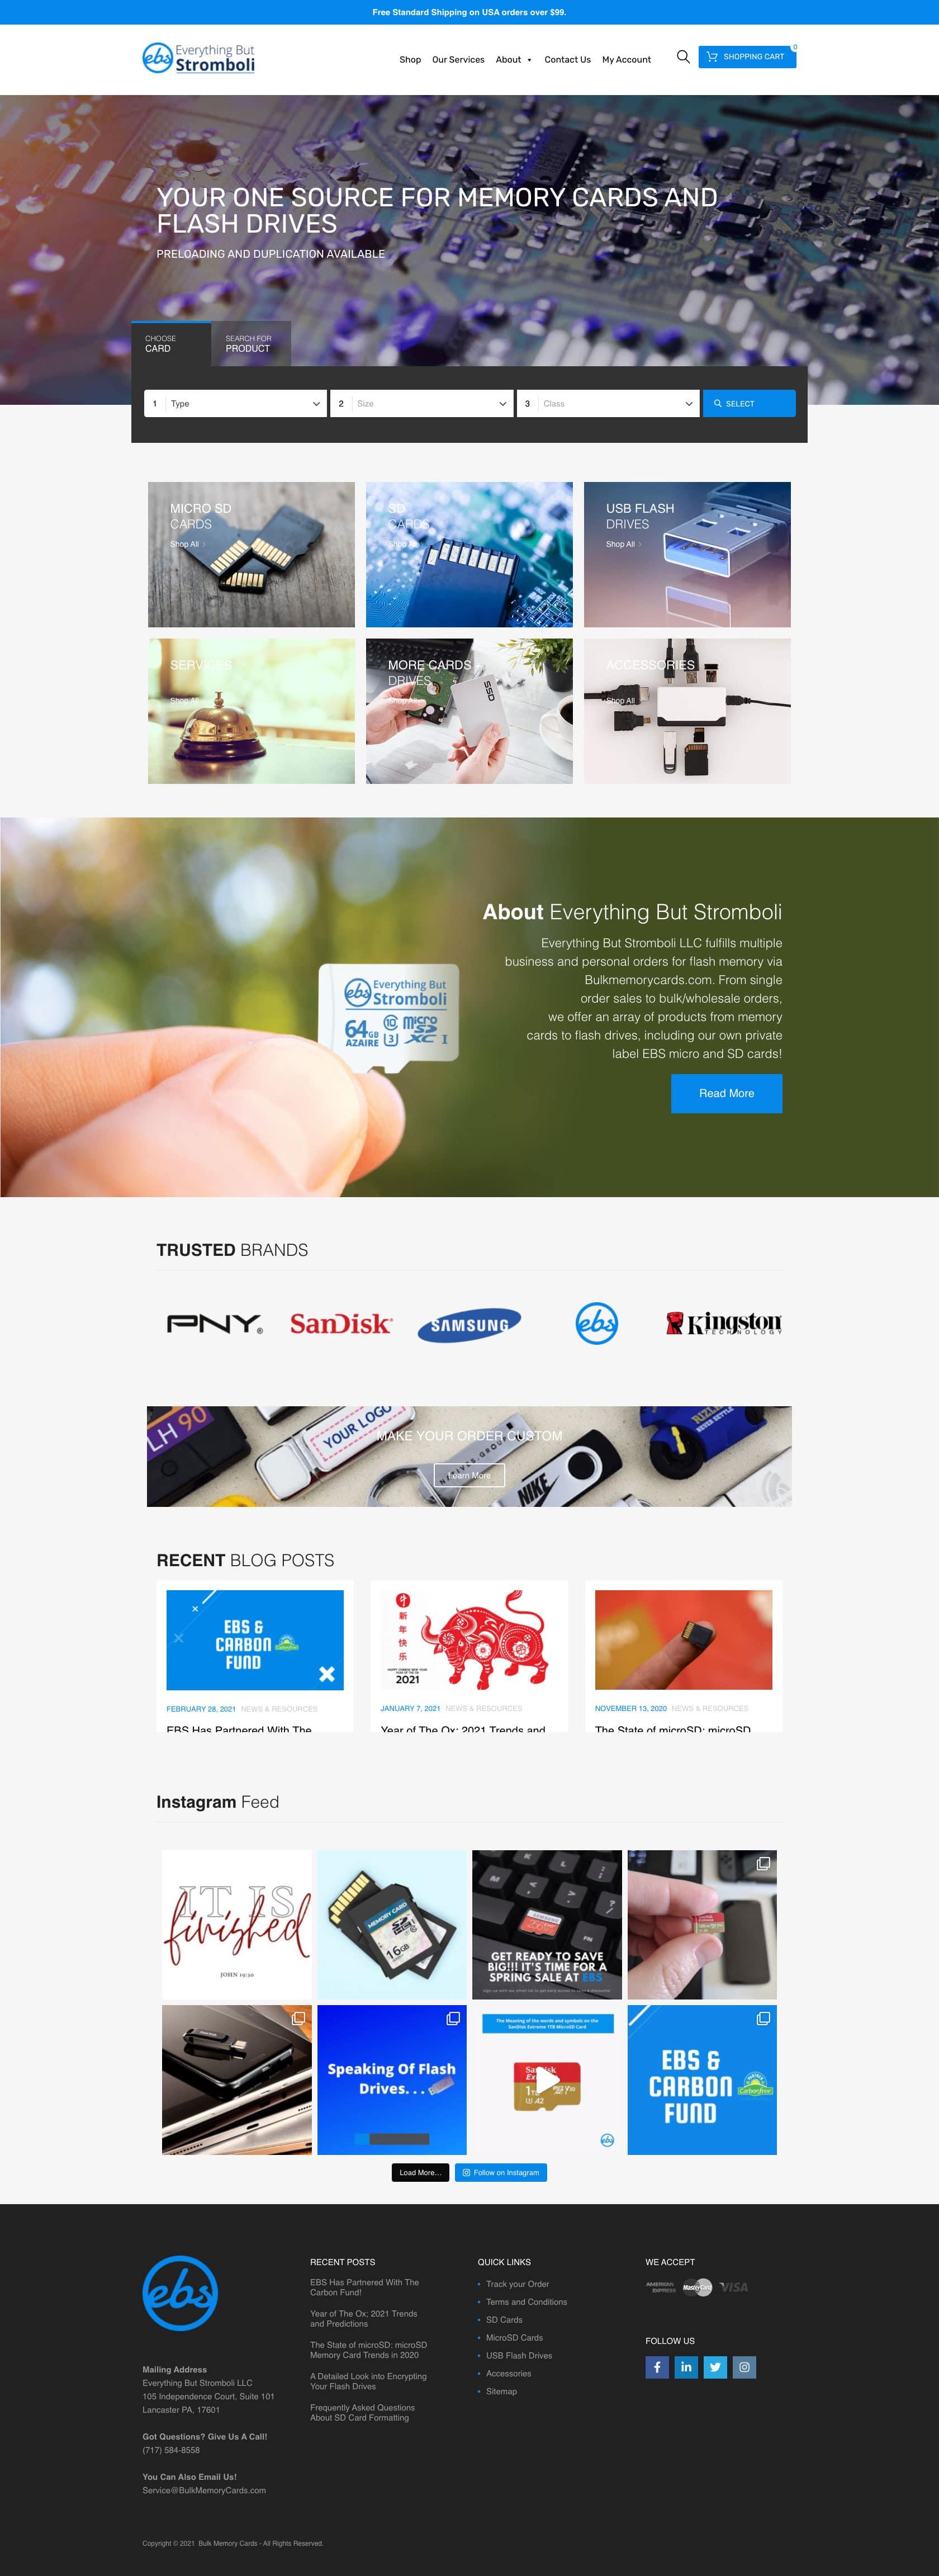 Bulkmemorycards.com Homepage Full